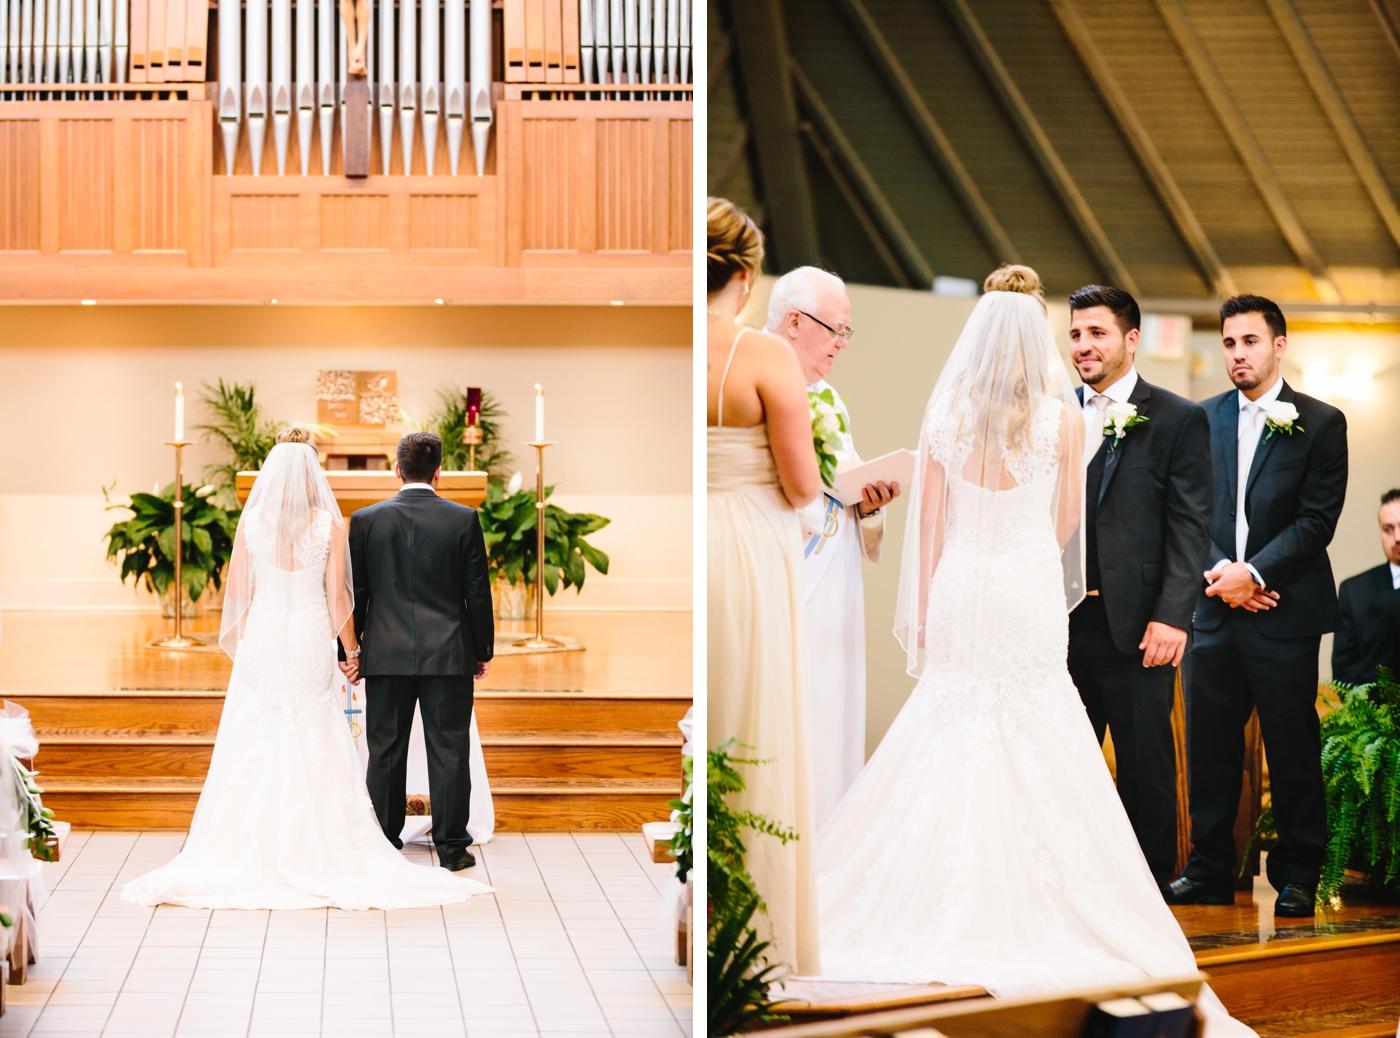 chicago-fine-art-wedding-photography-patano20